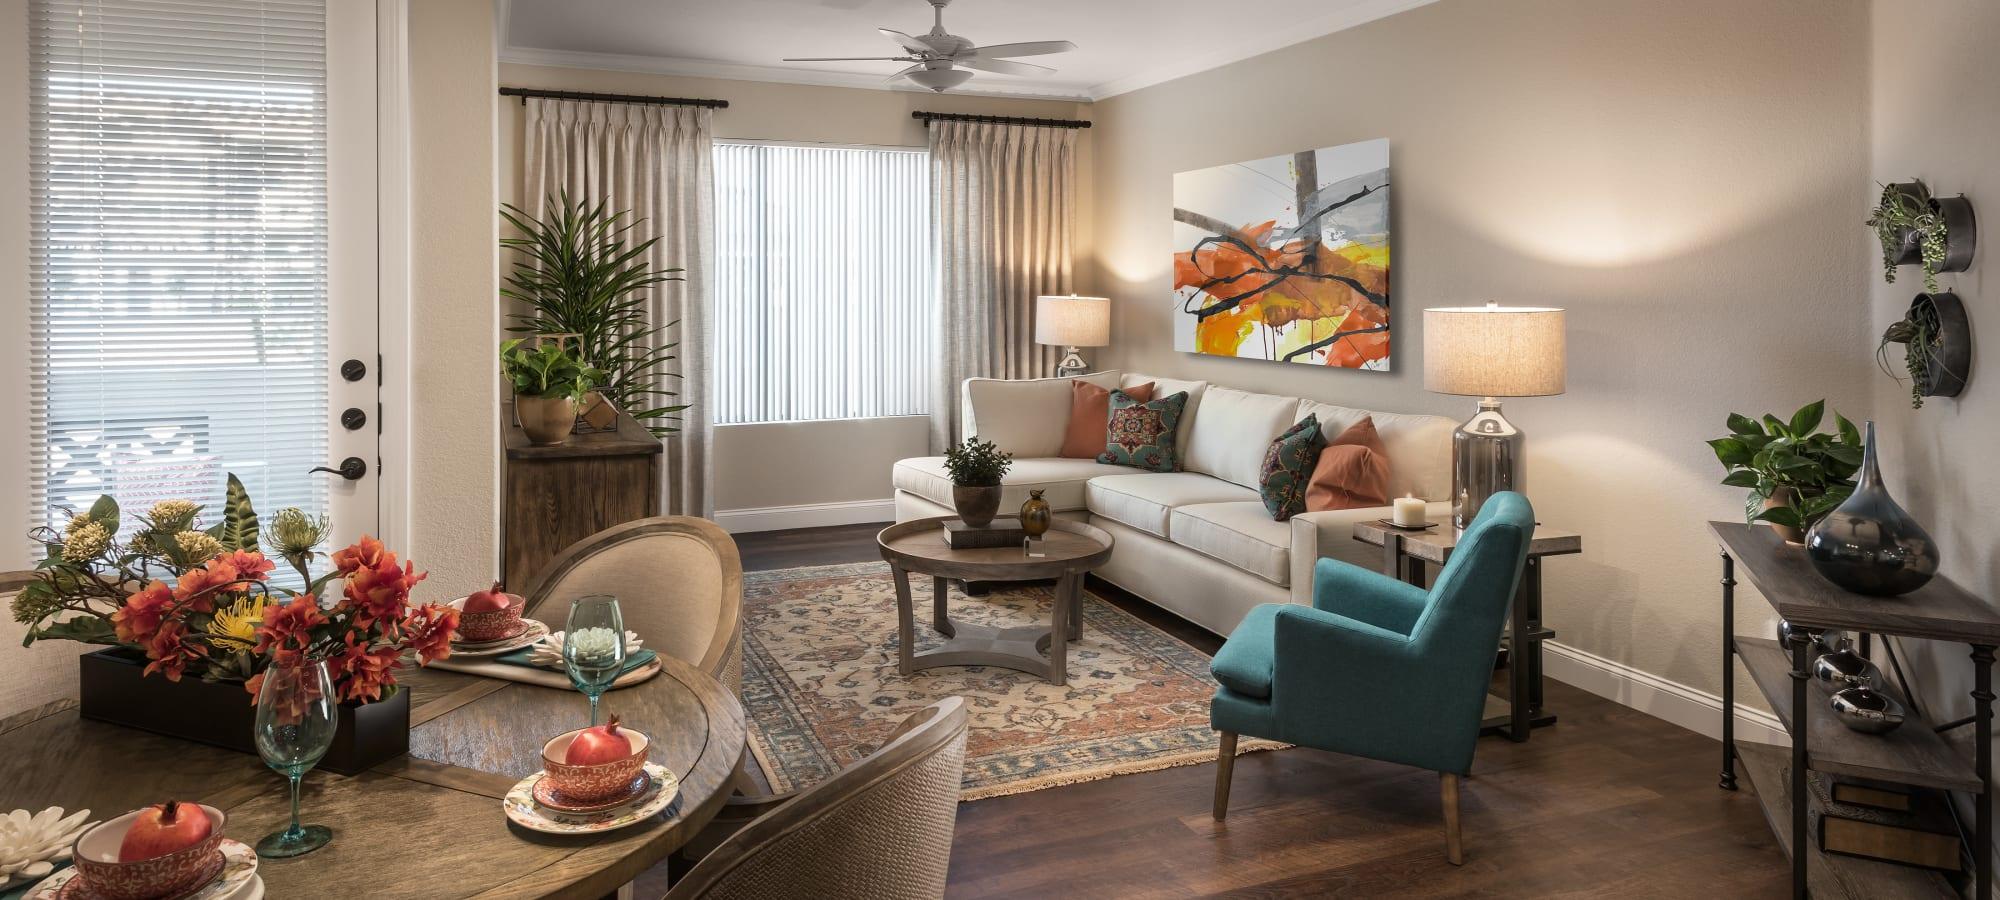 Cozy living room at San Artes in Scottsdale, Arizona